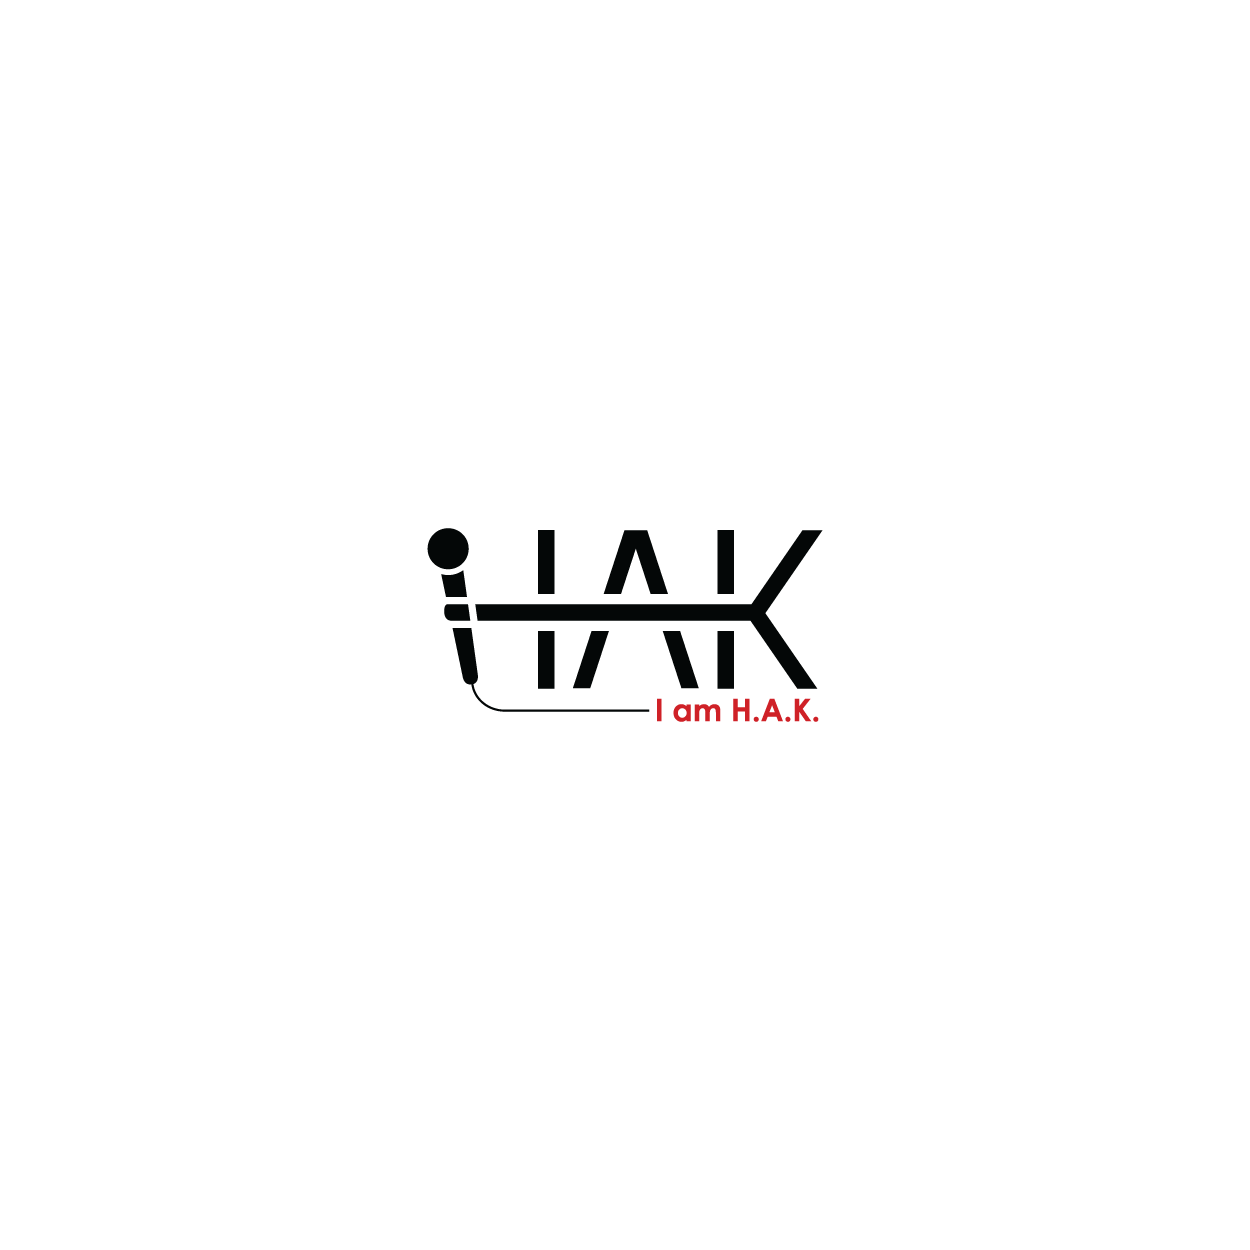 Create a distinct logo that captures the essence of myself as an artist.